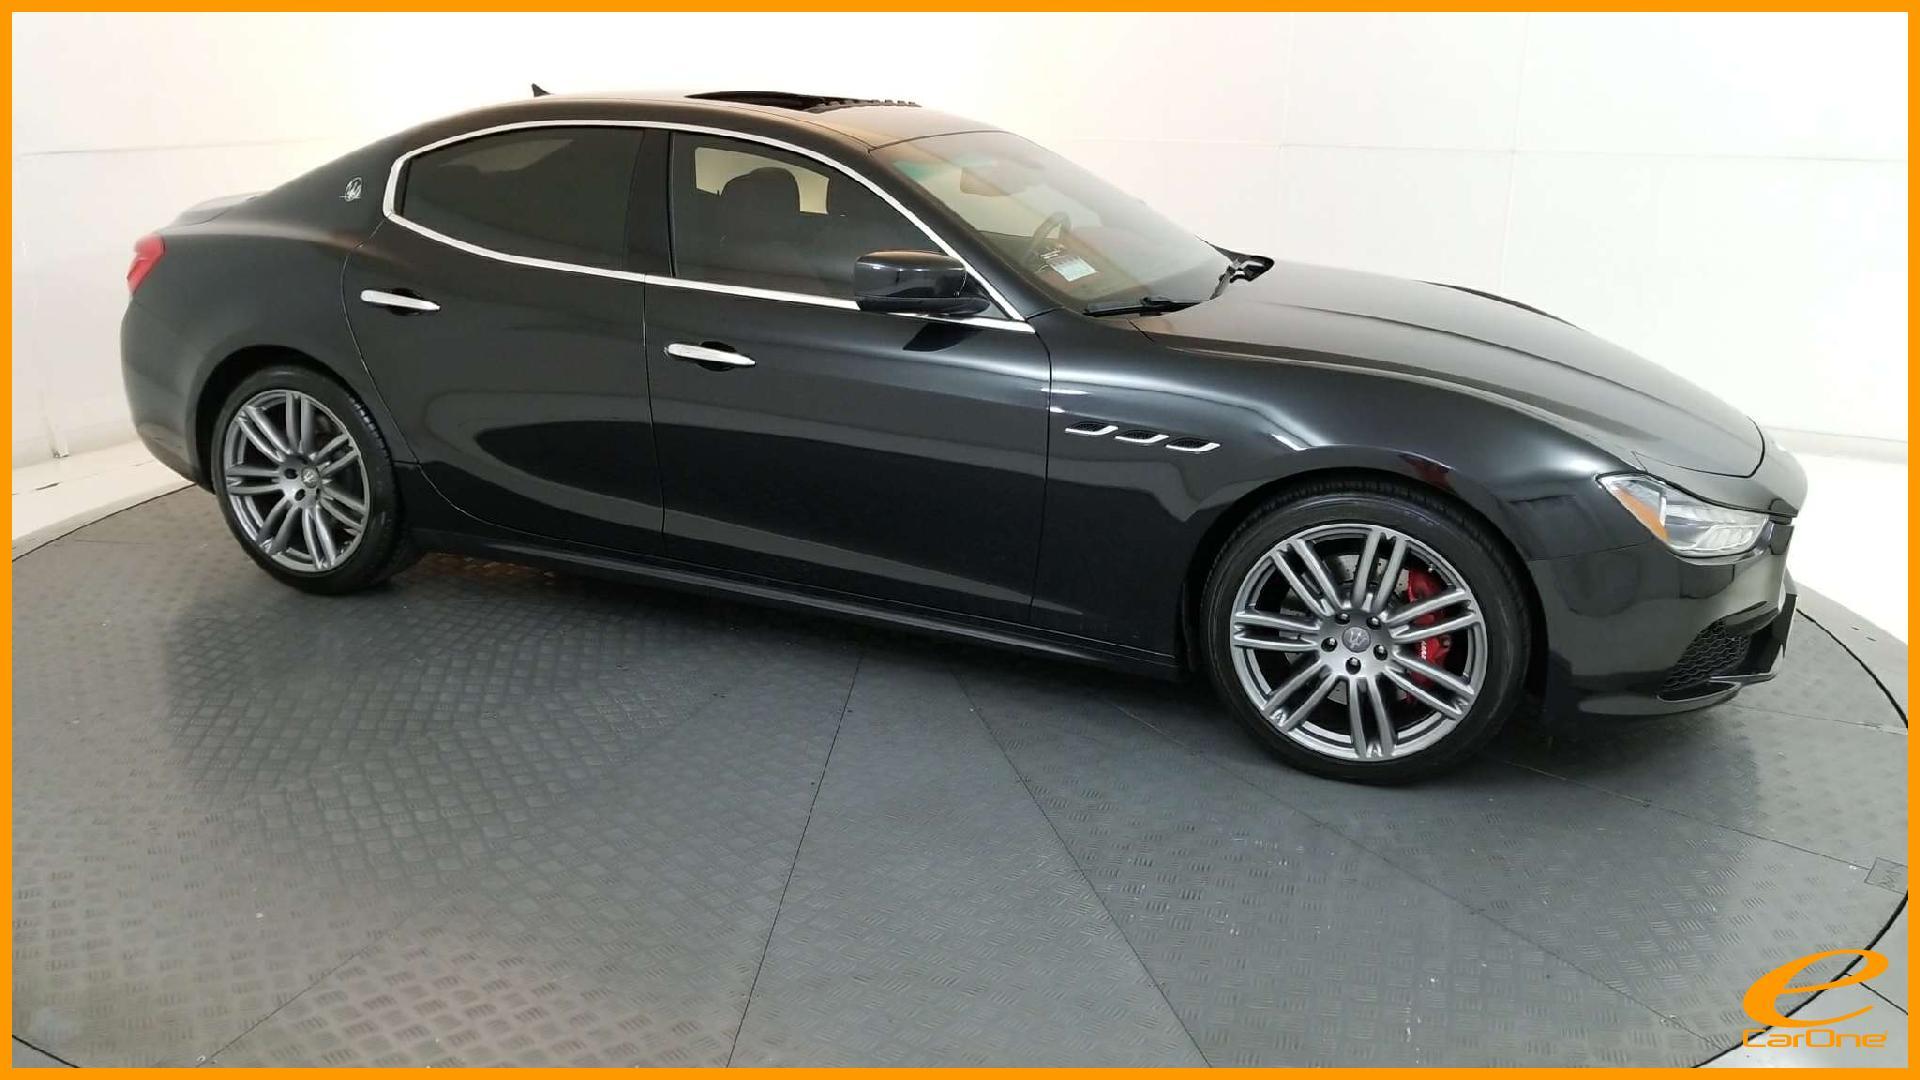 Used Maserati Price >> Used Maserati Carrollton Used Luxury Cars For Sale Near Dallas